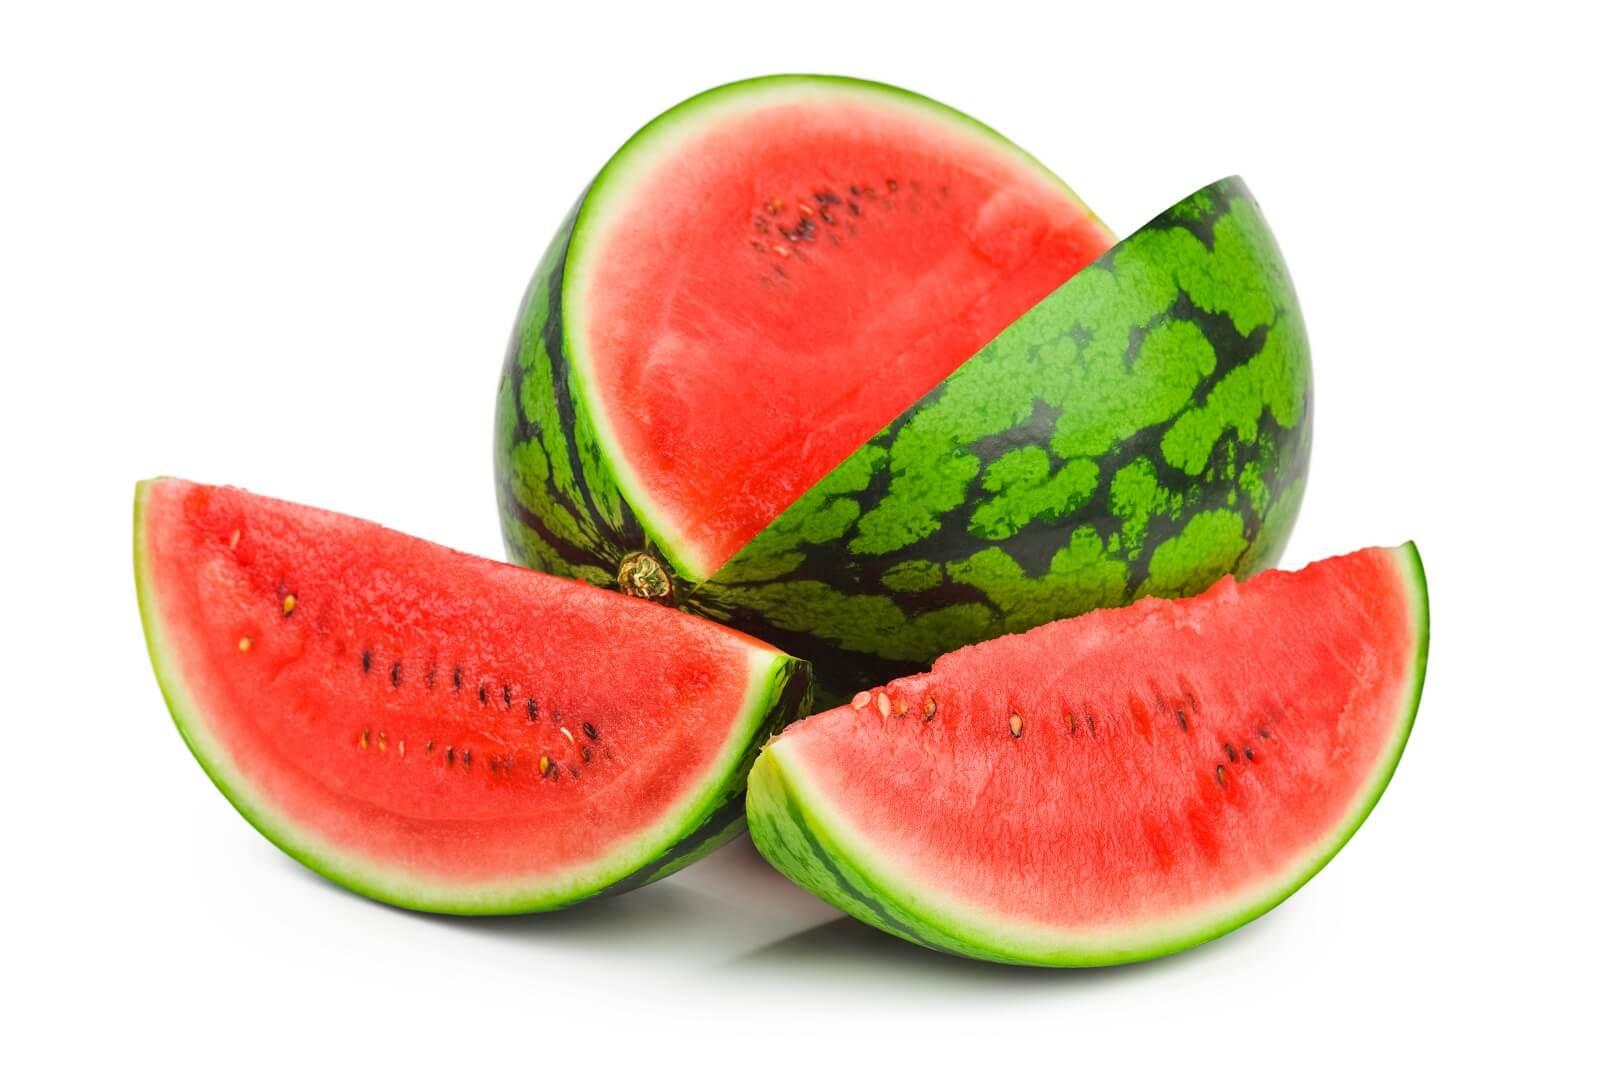 Watermelon Фрукты в Таиланде арбуз Фрукты и овощи Таиланда.